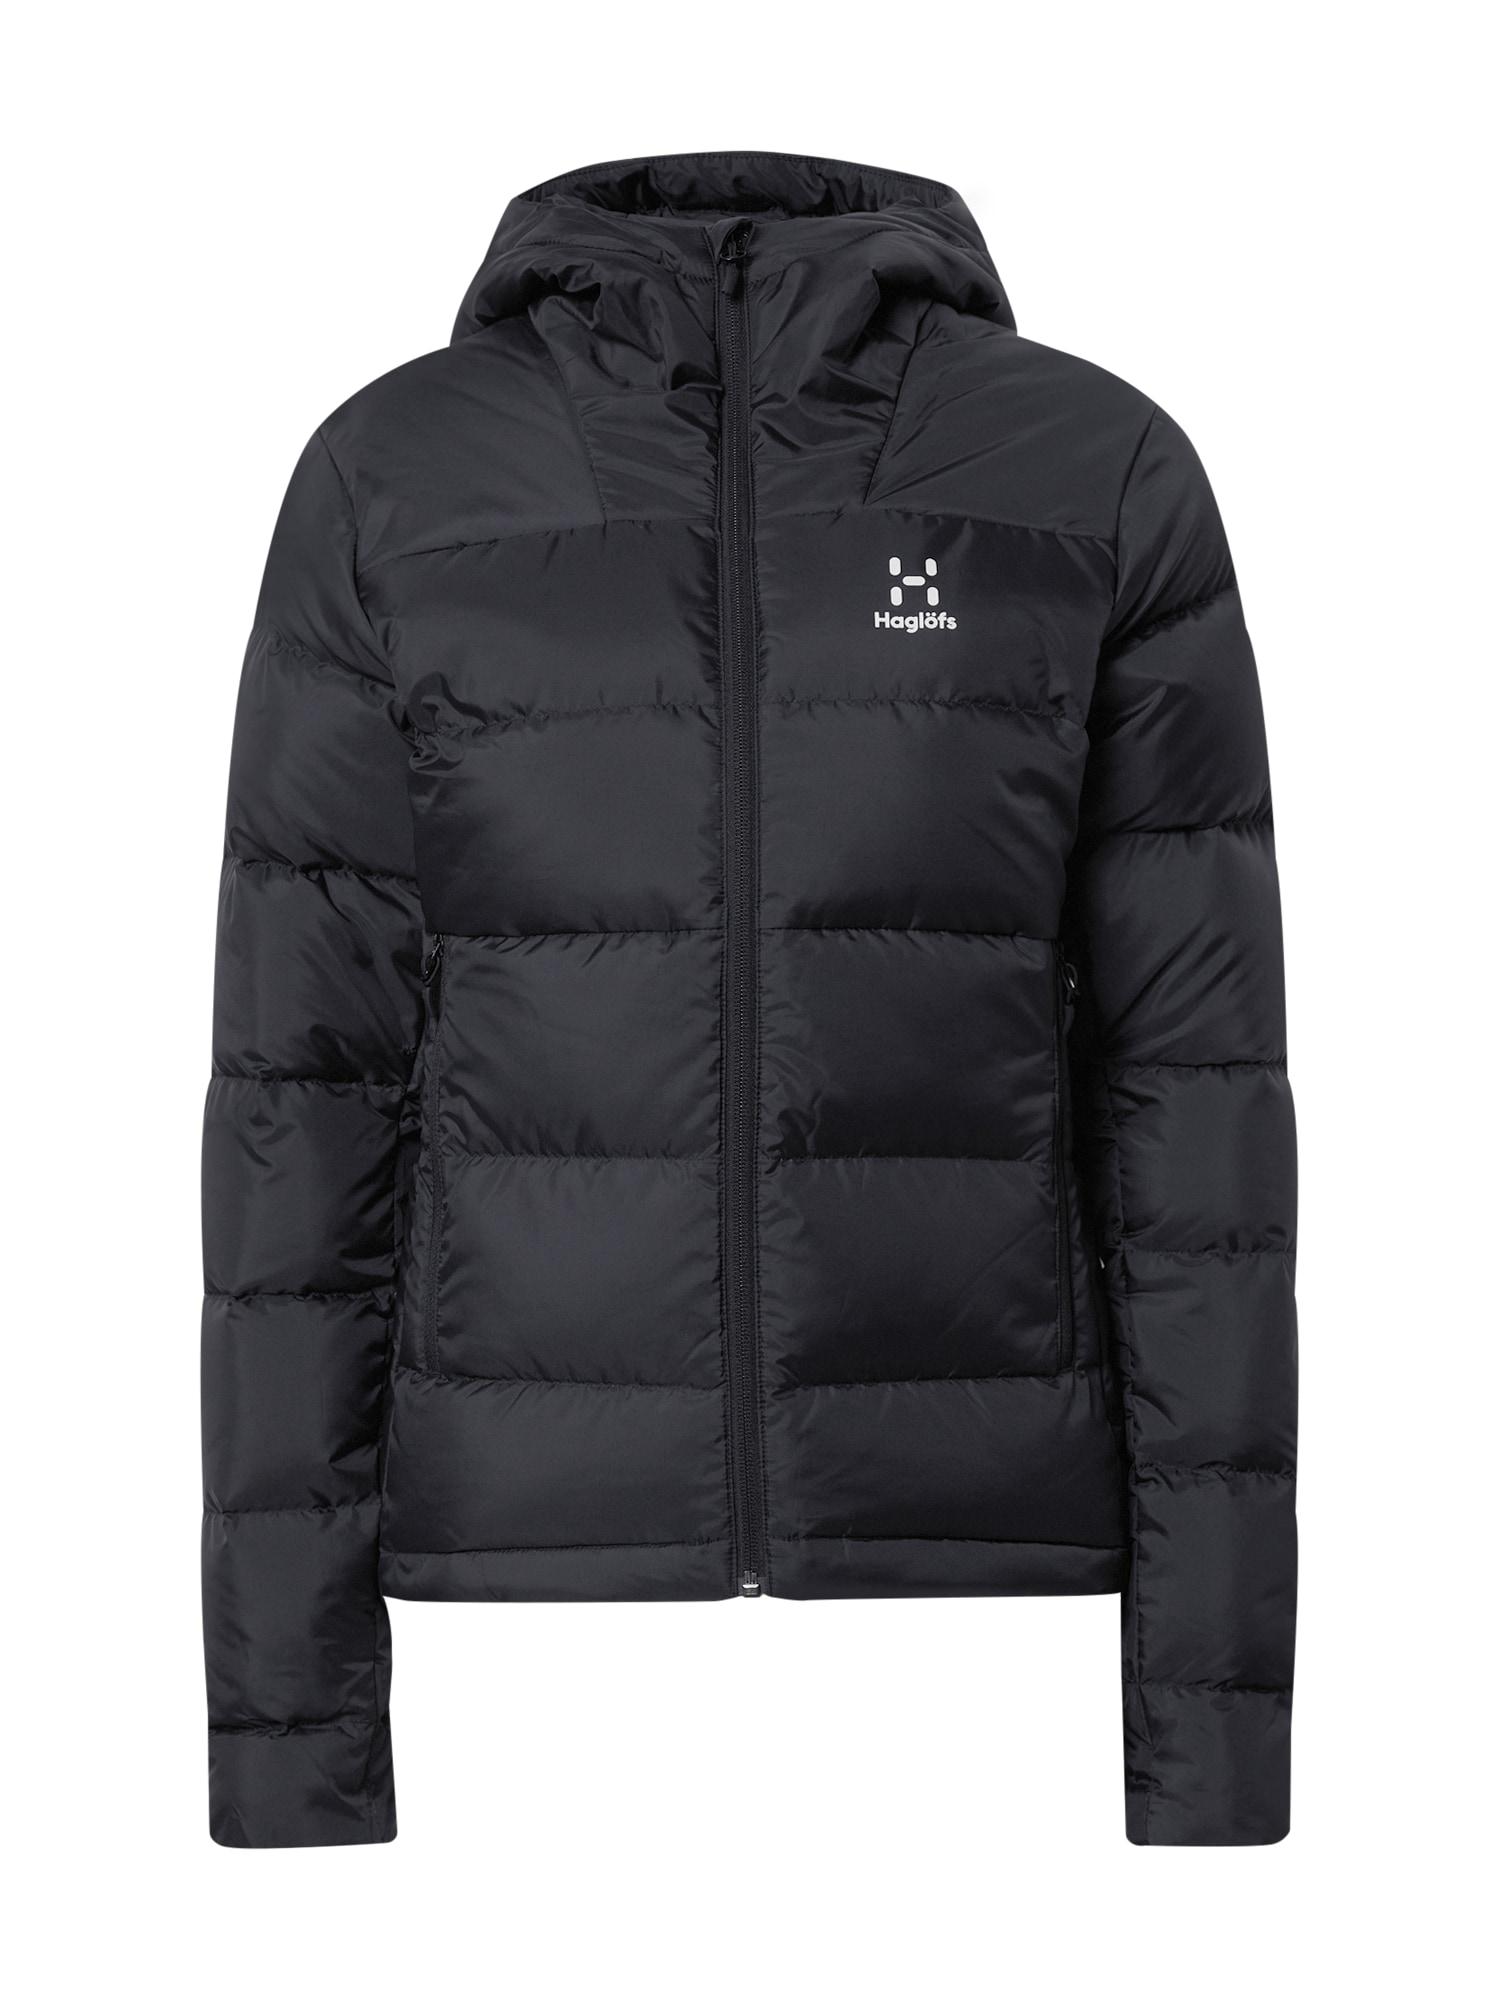 Haglöfs Outdoorová bunda 'Bield'  černá